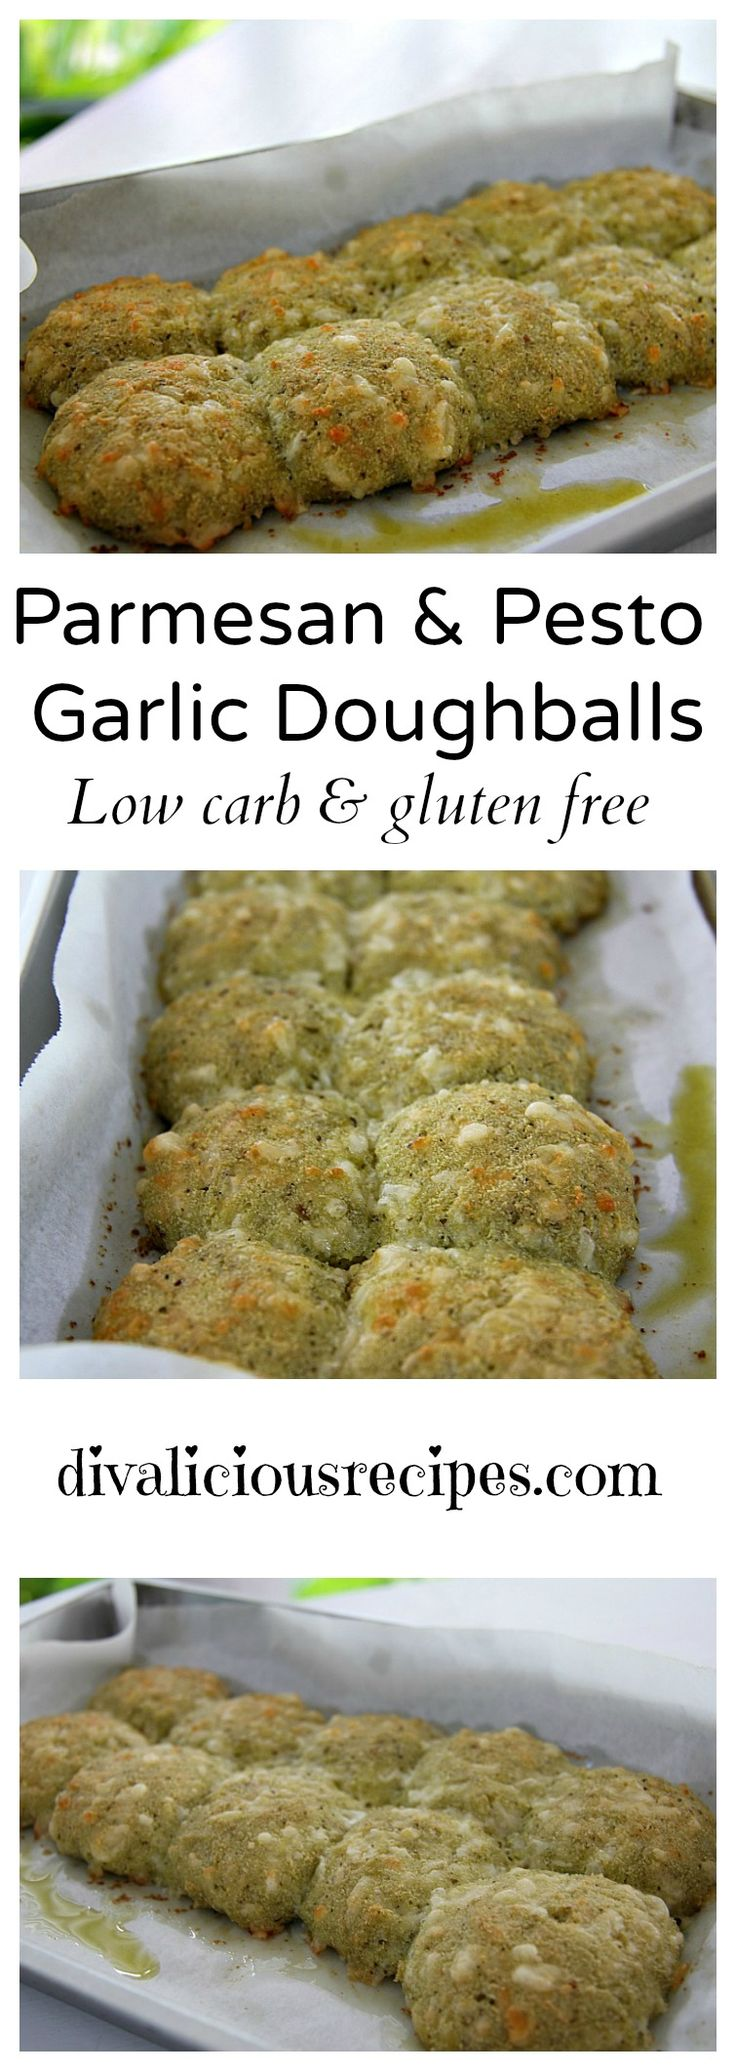 Parmesan and pesto doughballs